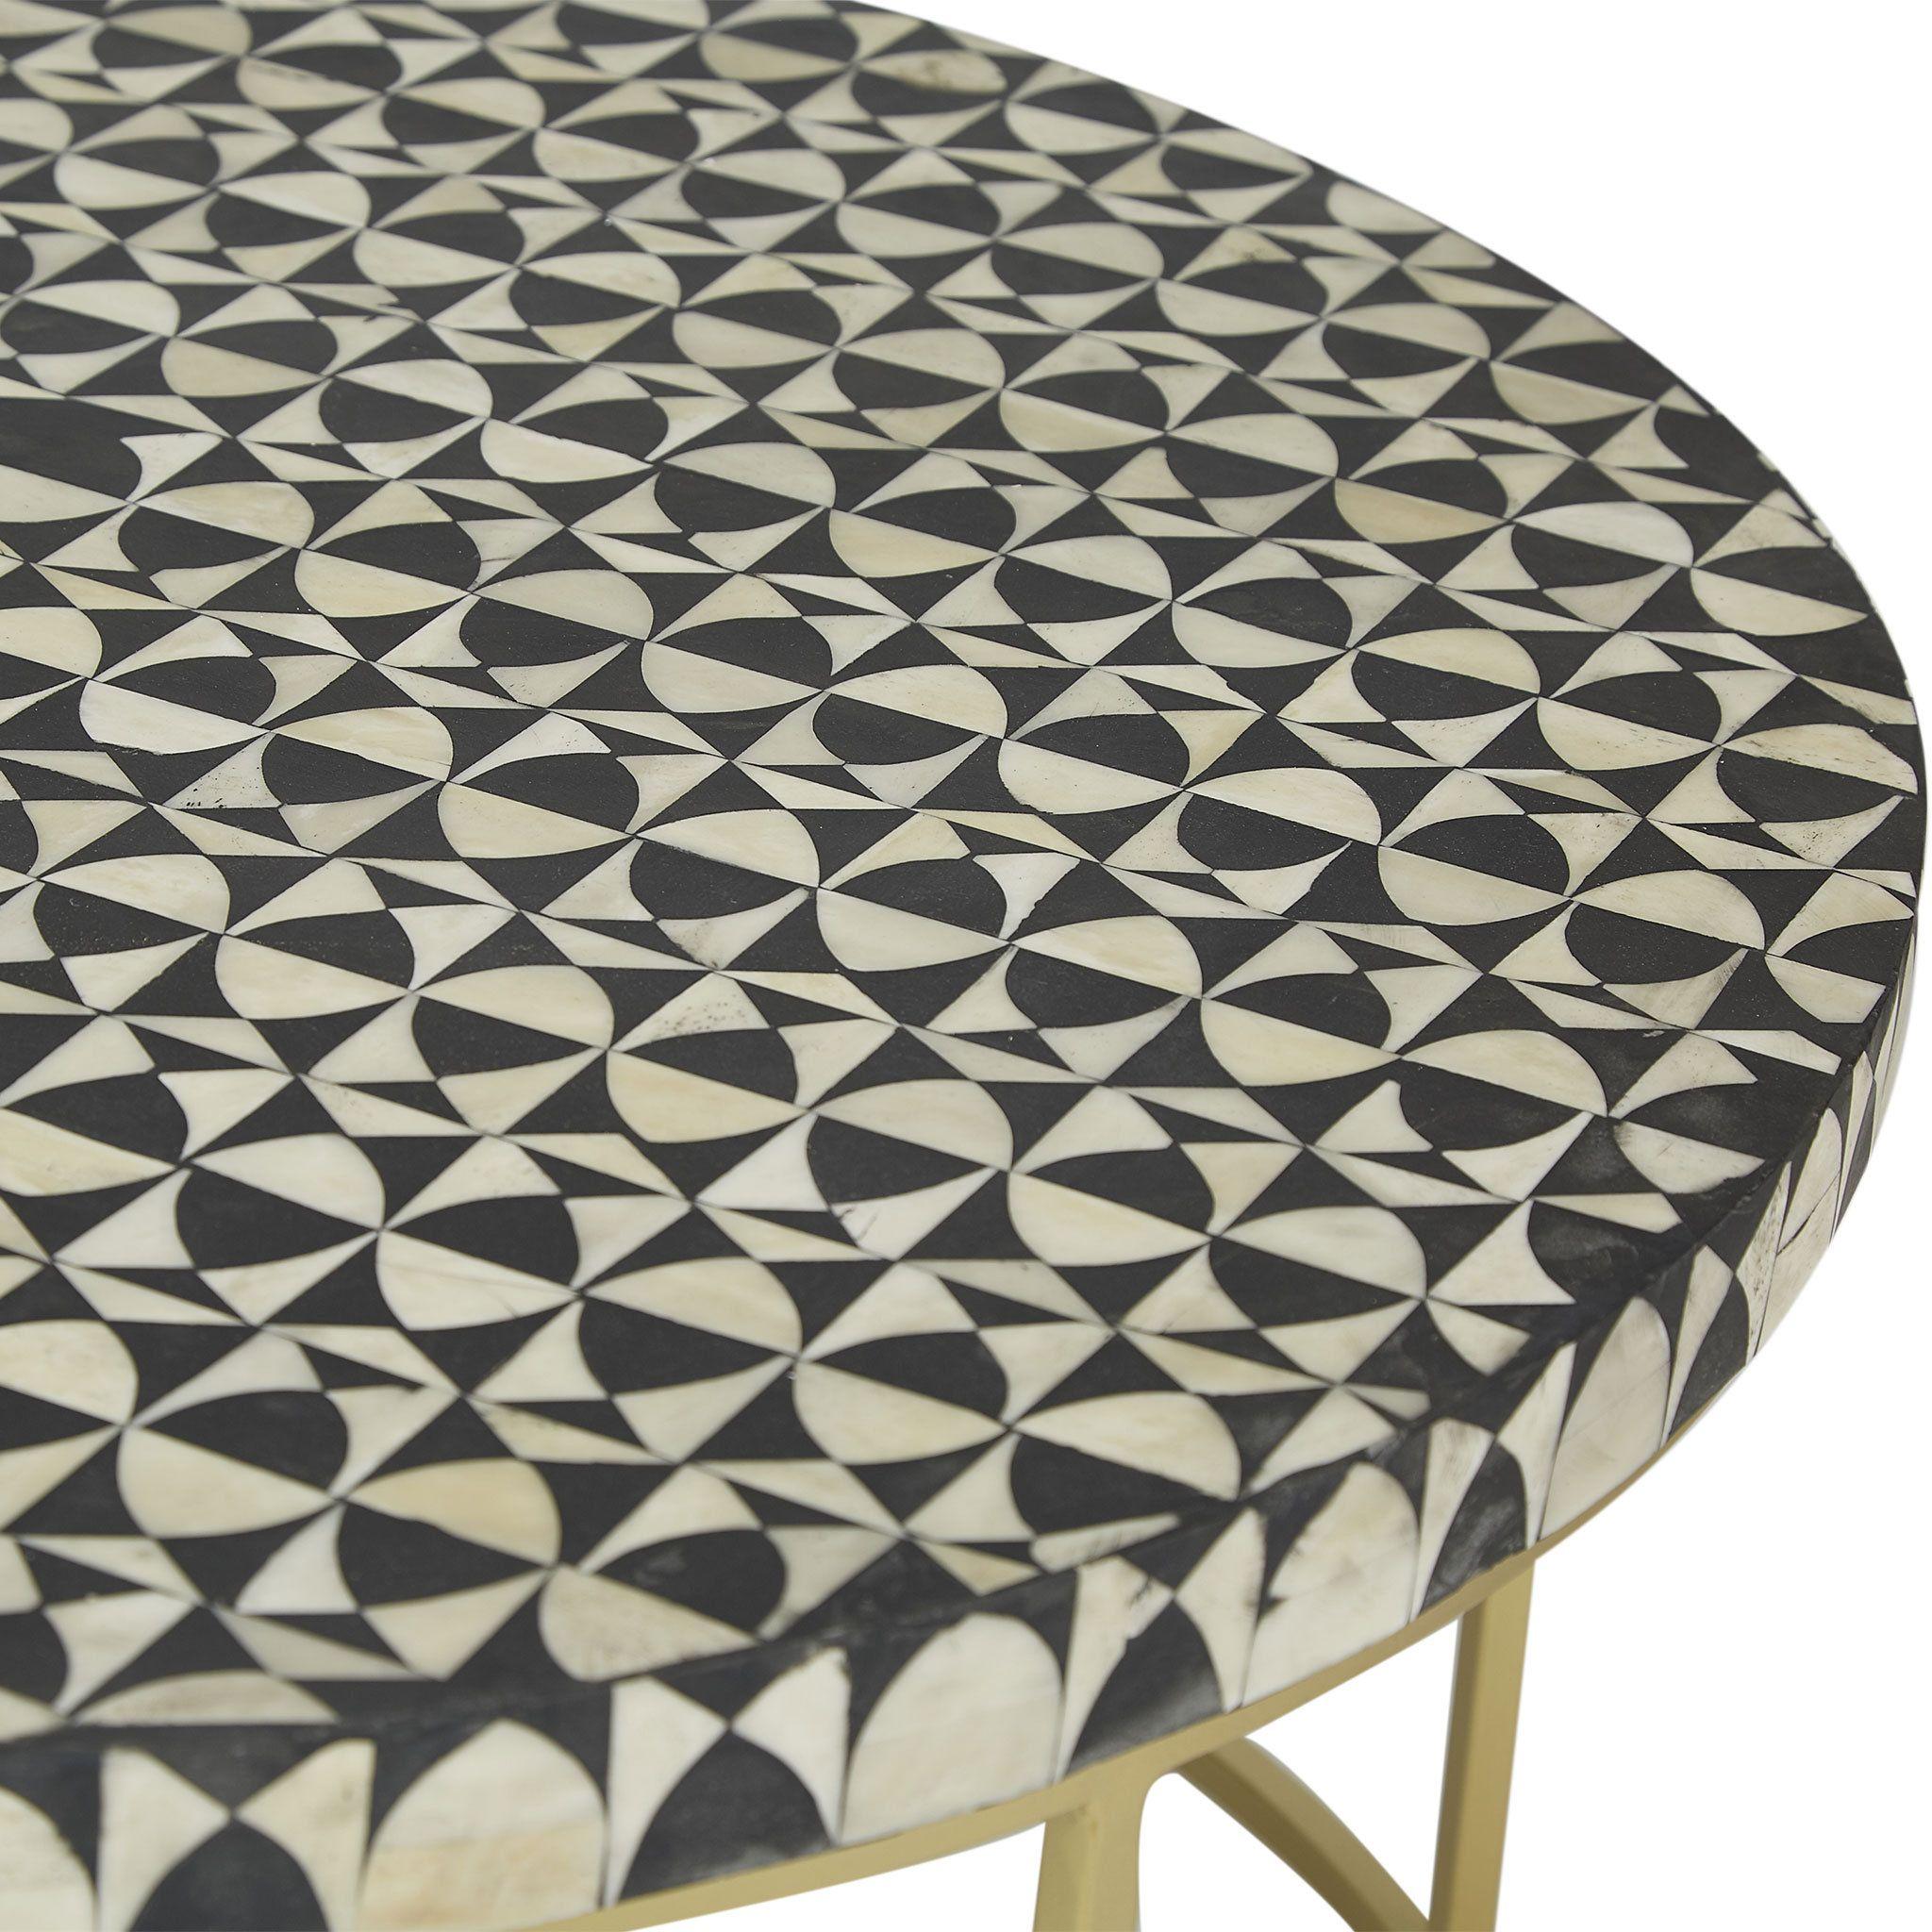 Bone Inlay Round Coffee Table Wine Glass Black / White